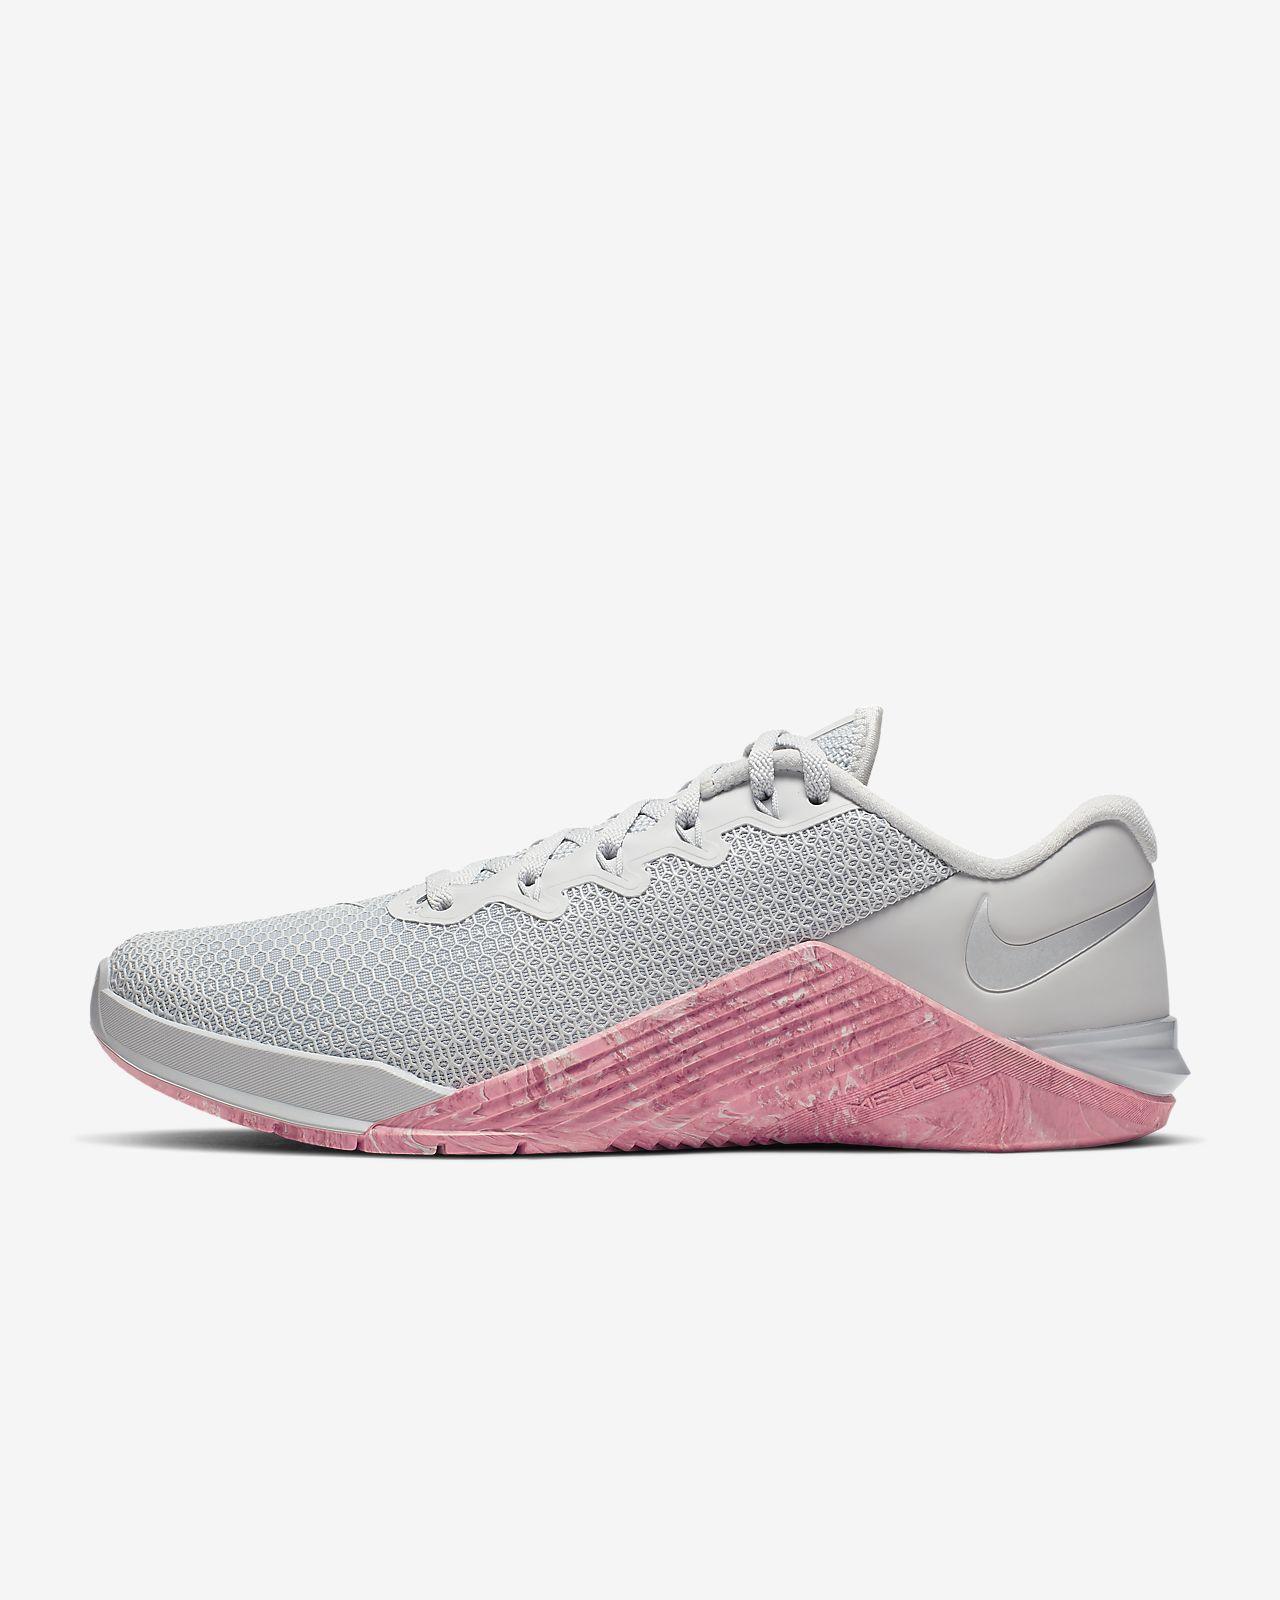 Dámská tréninková bota Nike Metcon 5